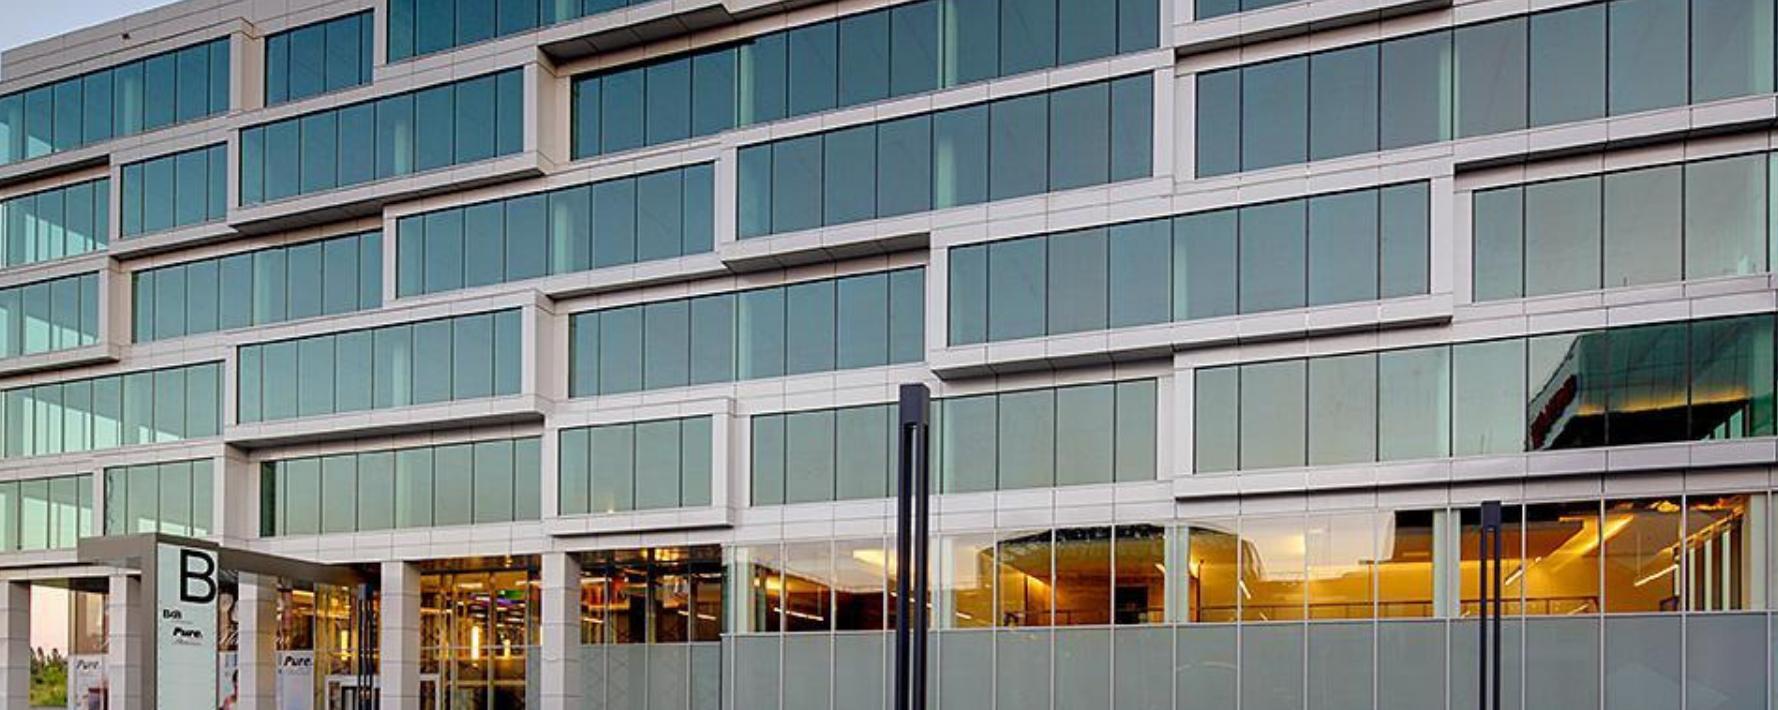 PARSOL   Float glas in glazen gevel   Saint-Gobain Building Glass